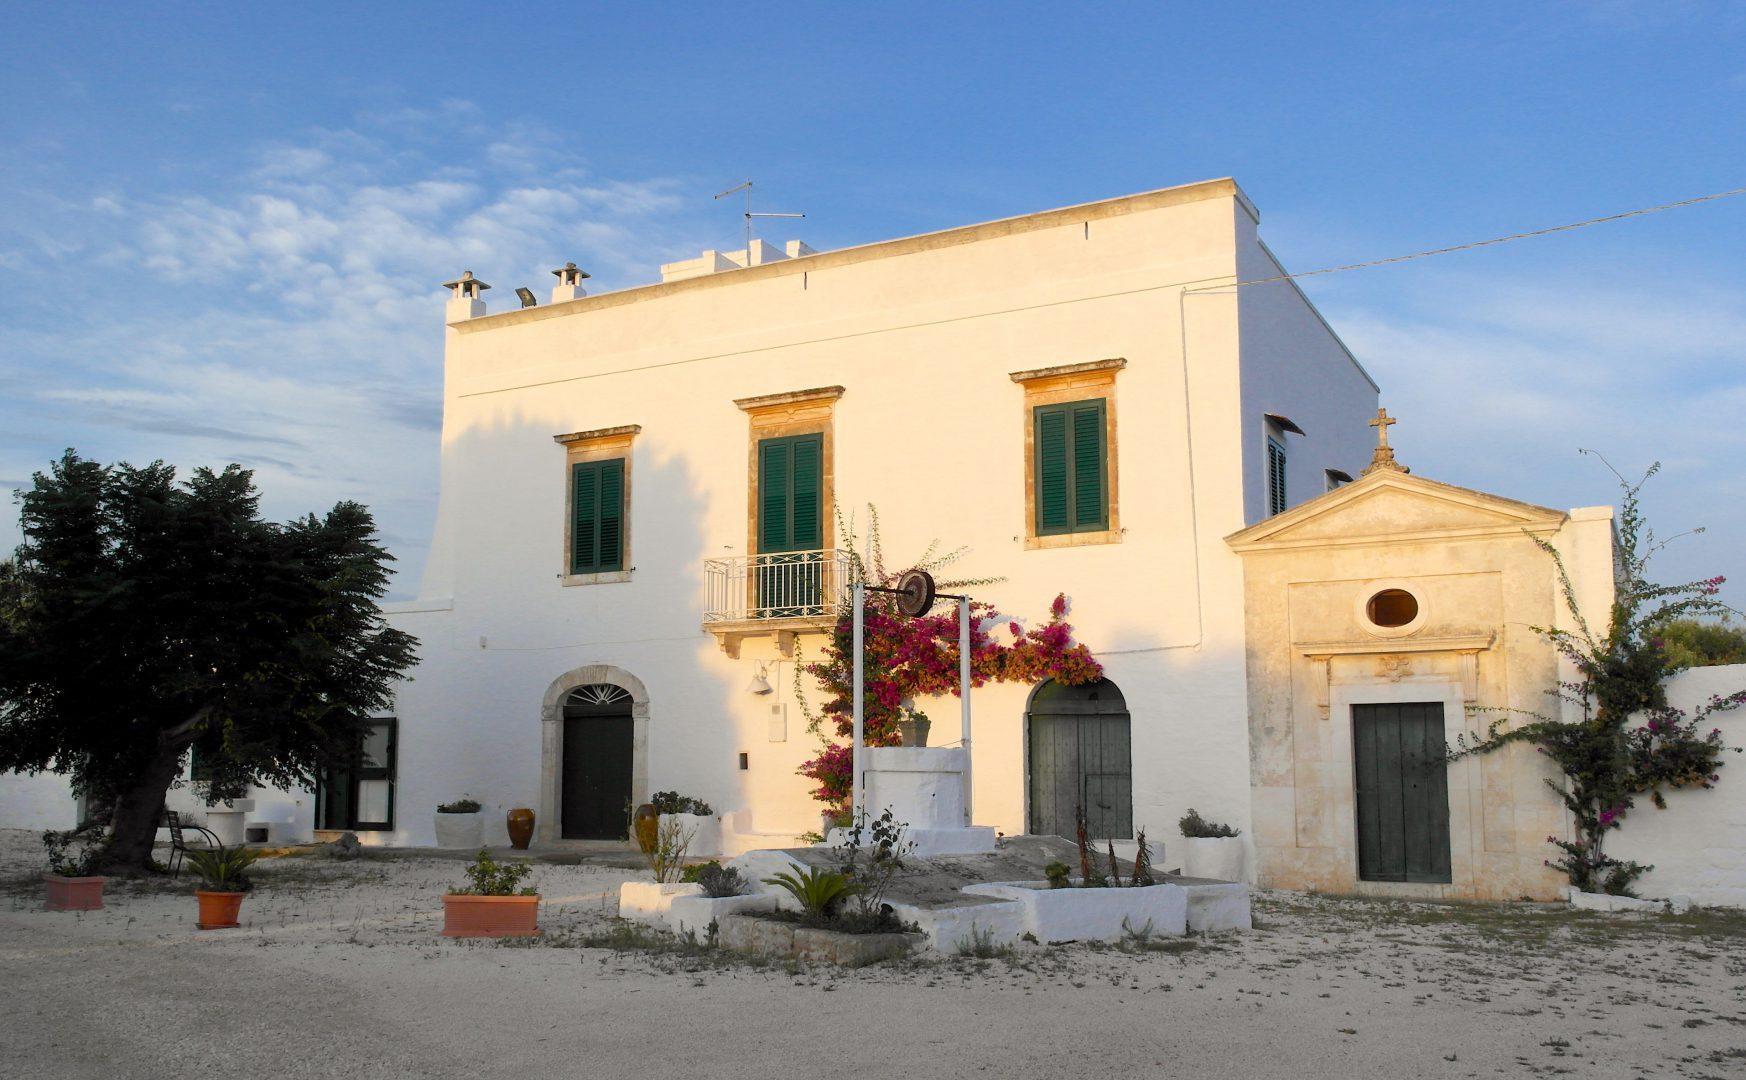 Masseria Bellavista historic holiday vacation rental villa in ostuni puglia with seaview pool at dusk